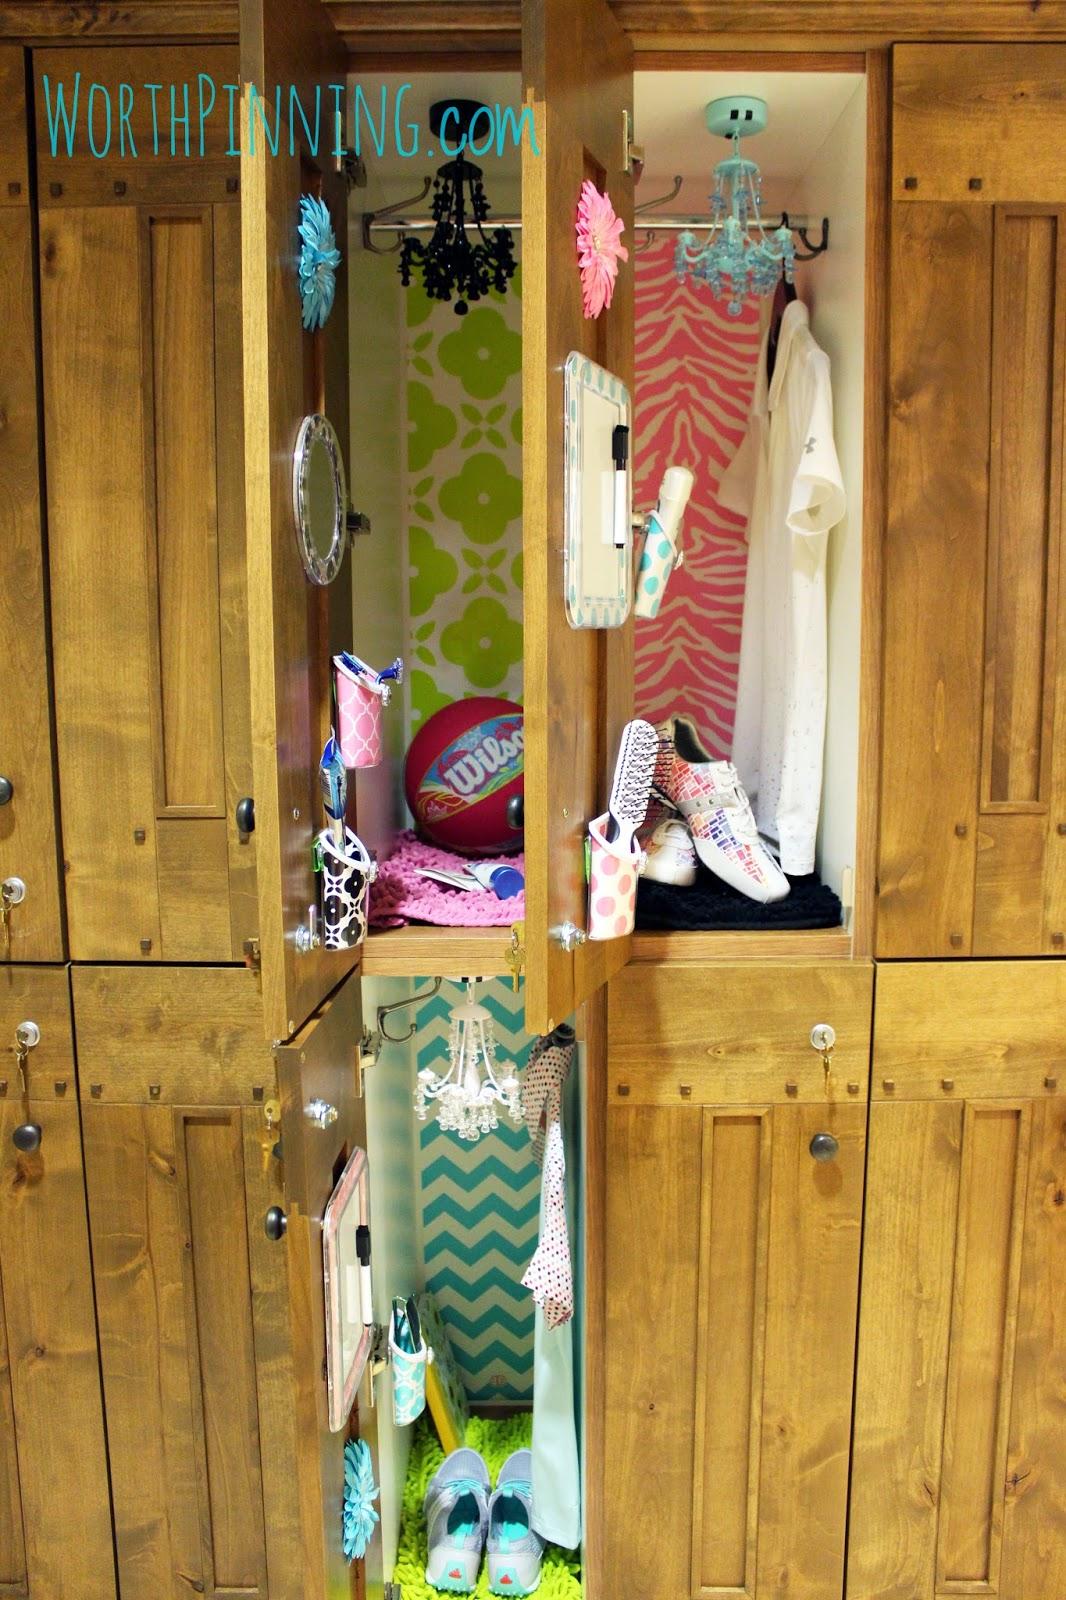 Gymnastics Wallpapers For Locker Wallpapersafari